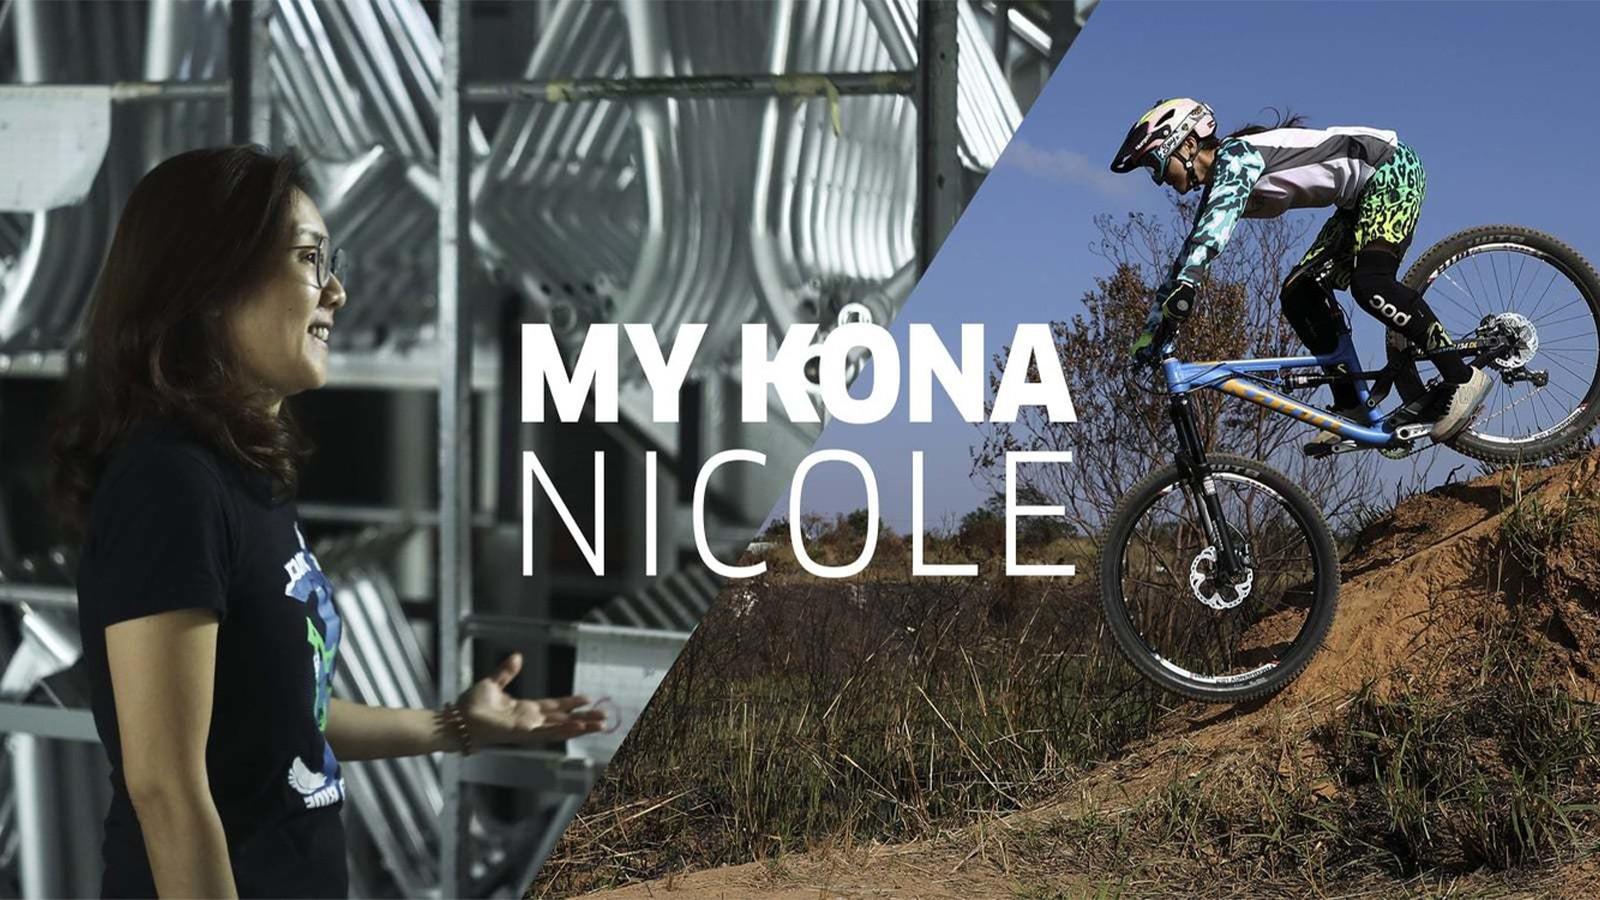 Where Does Your Bike Come From? My Kona - Nicole Hsu